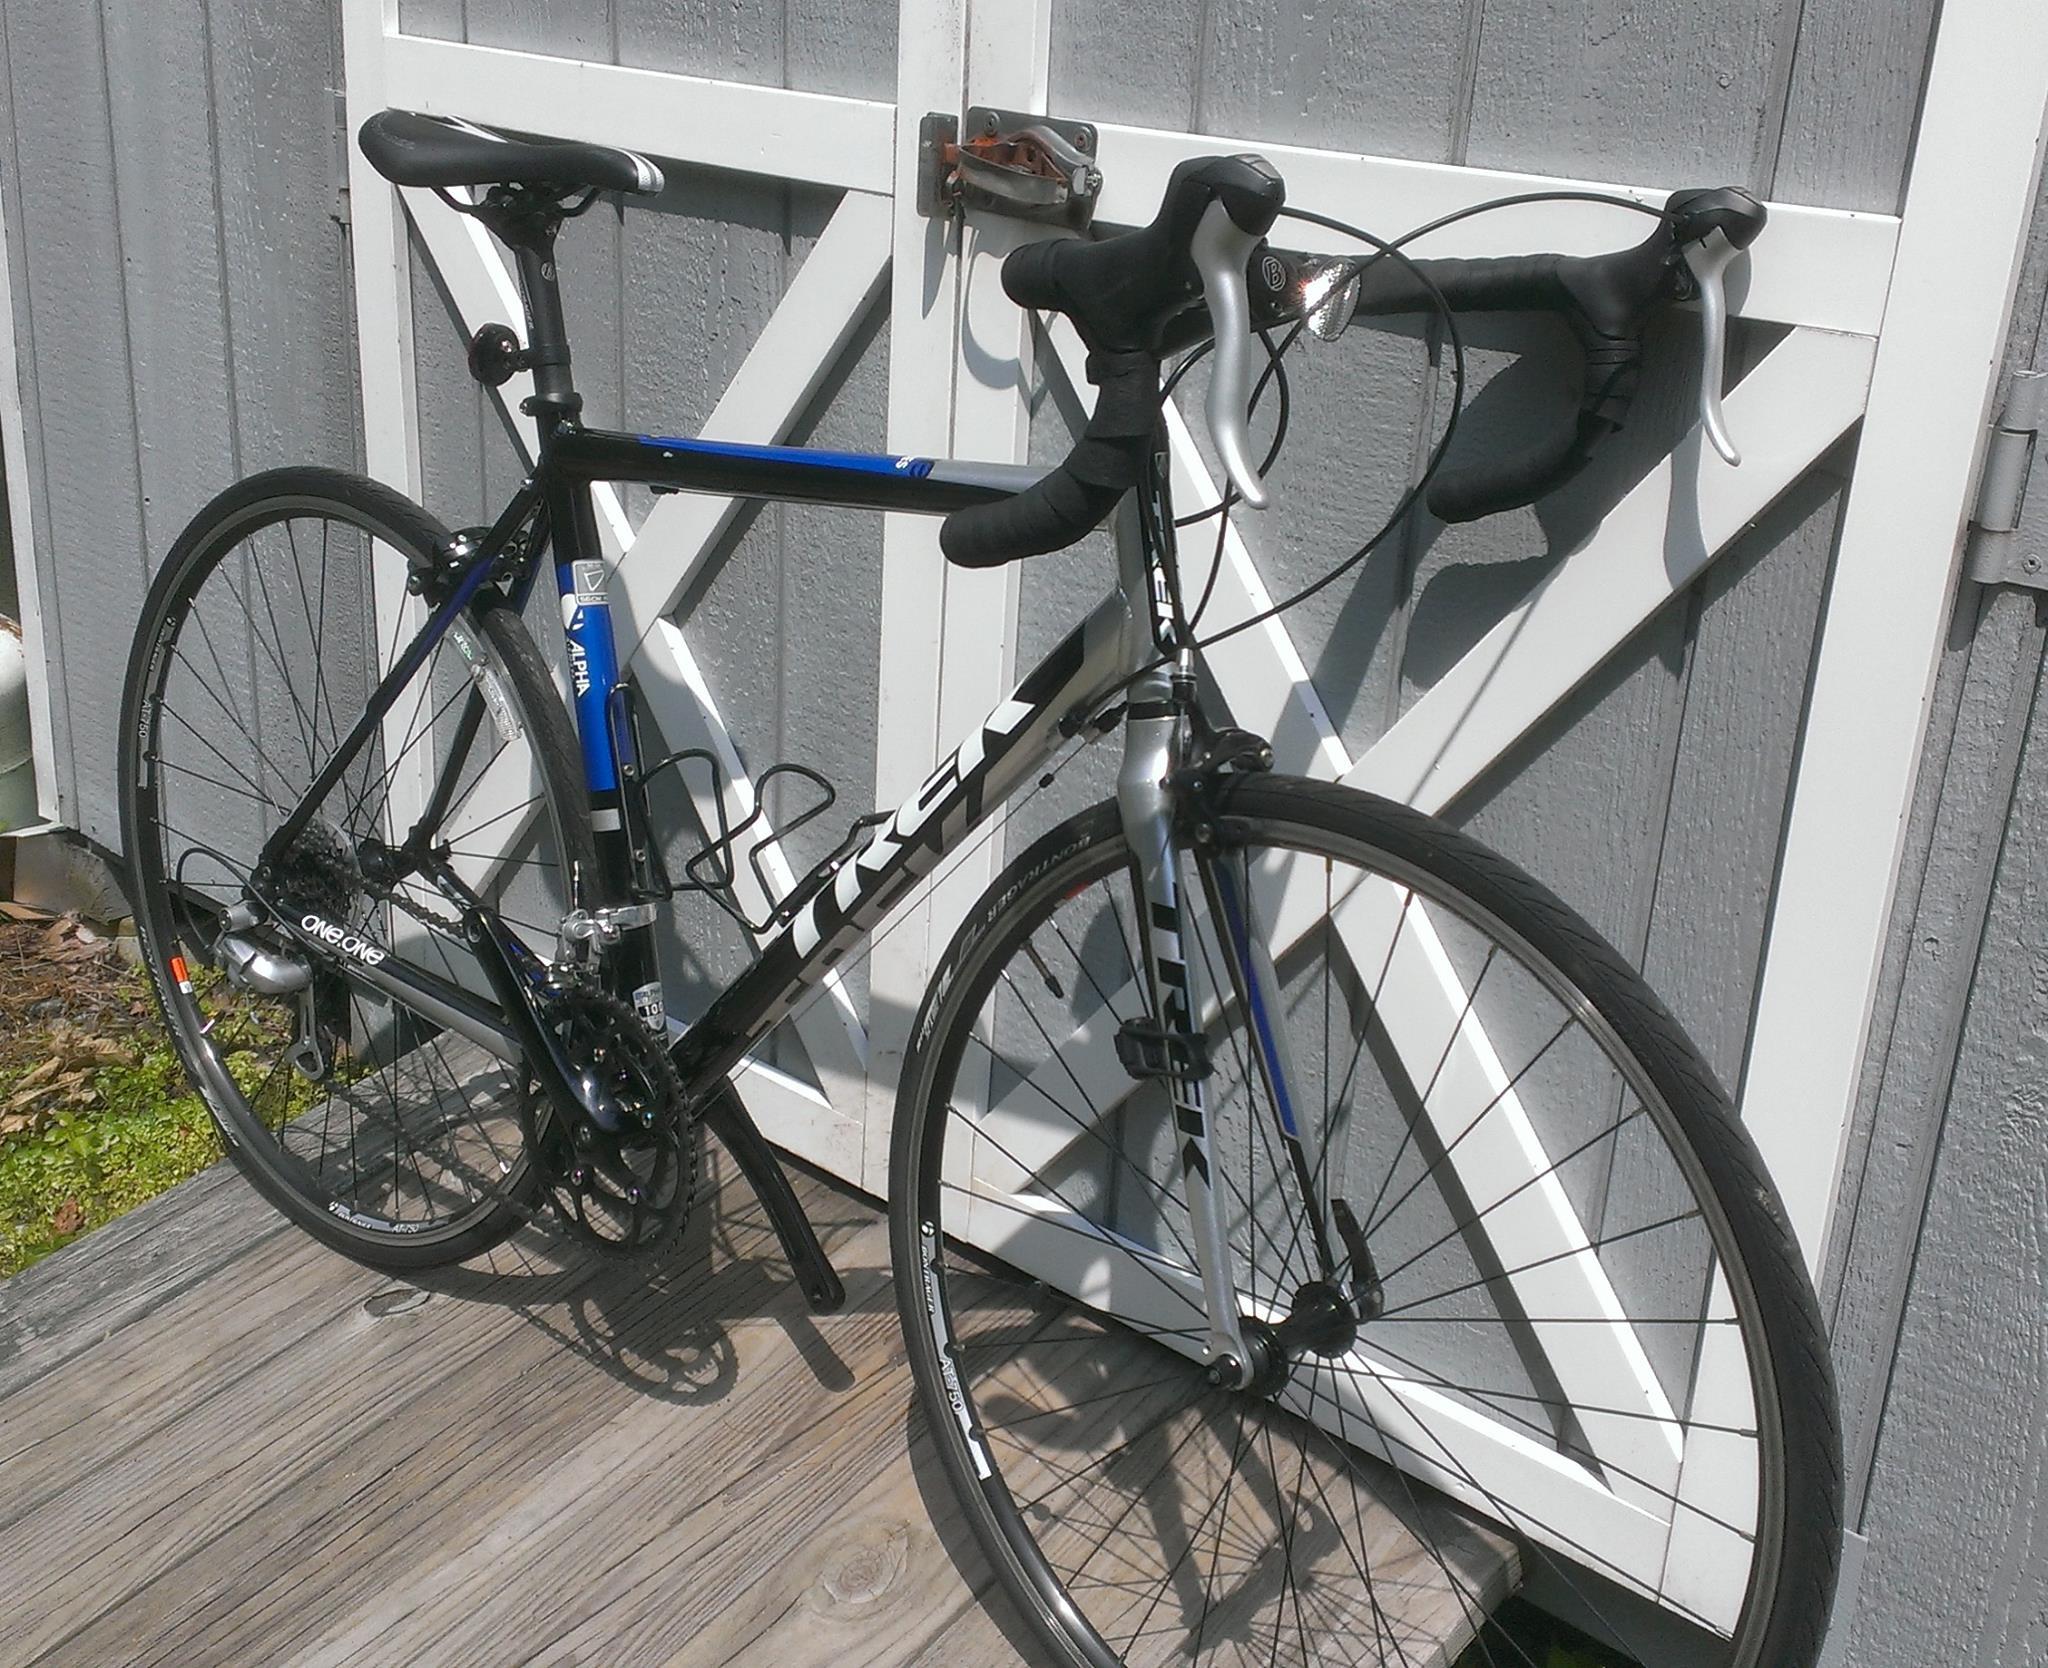 File:2012 Trek 1.1 Road Bike.jpg - Wikimedia Commons